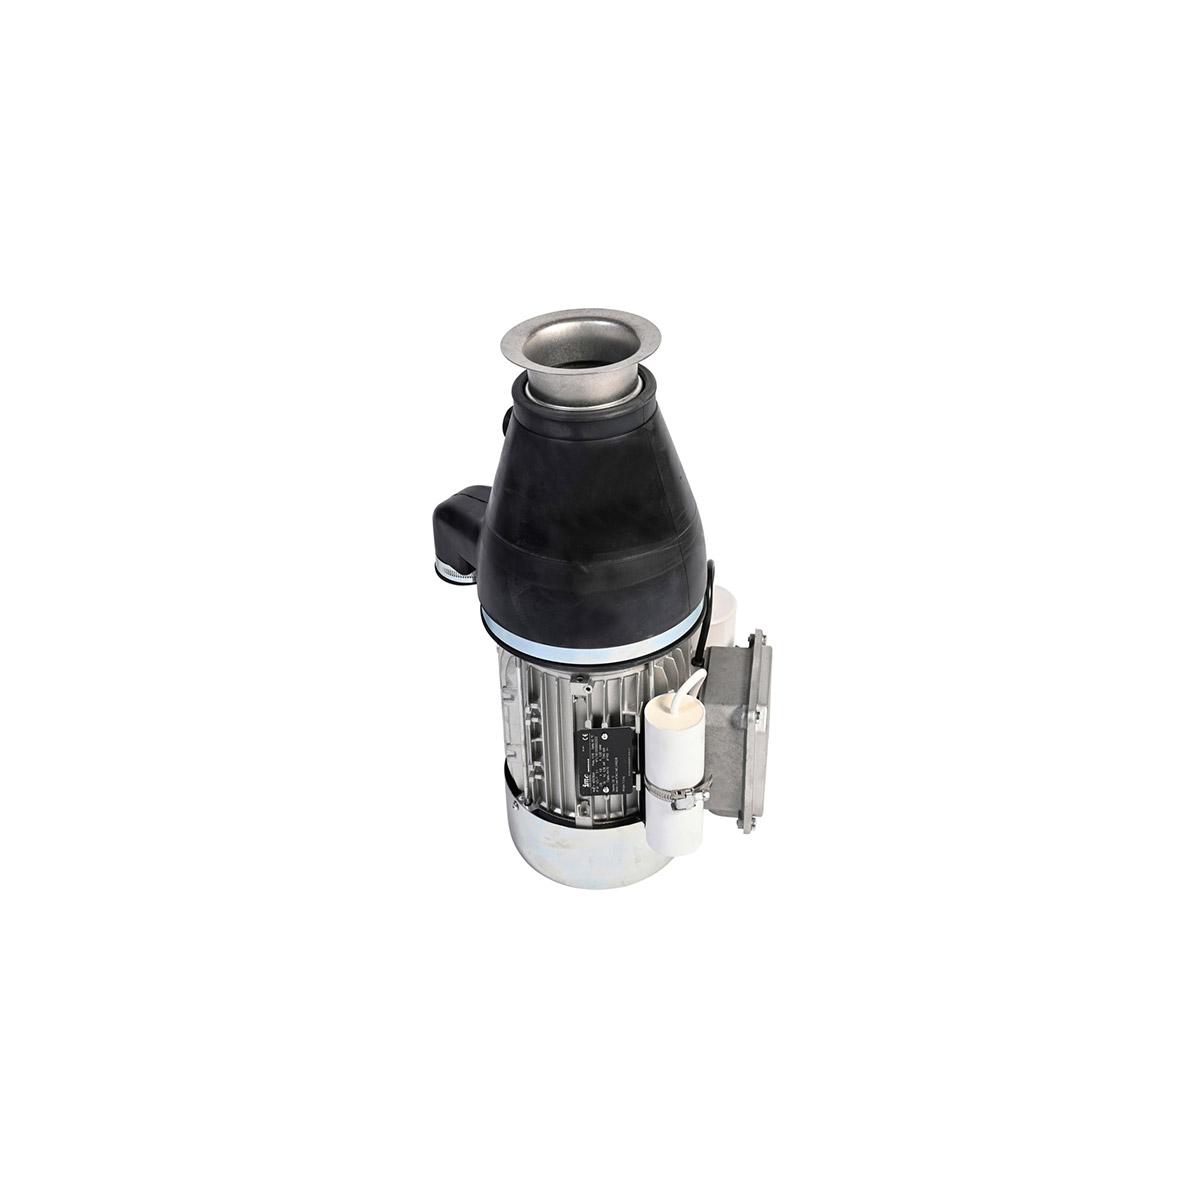 F52/301 - IMC Vulture 523 Under-sink Food Waste Disposer - fits 89 mm sink opening - 1 Phase - 0.55 kW